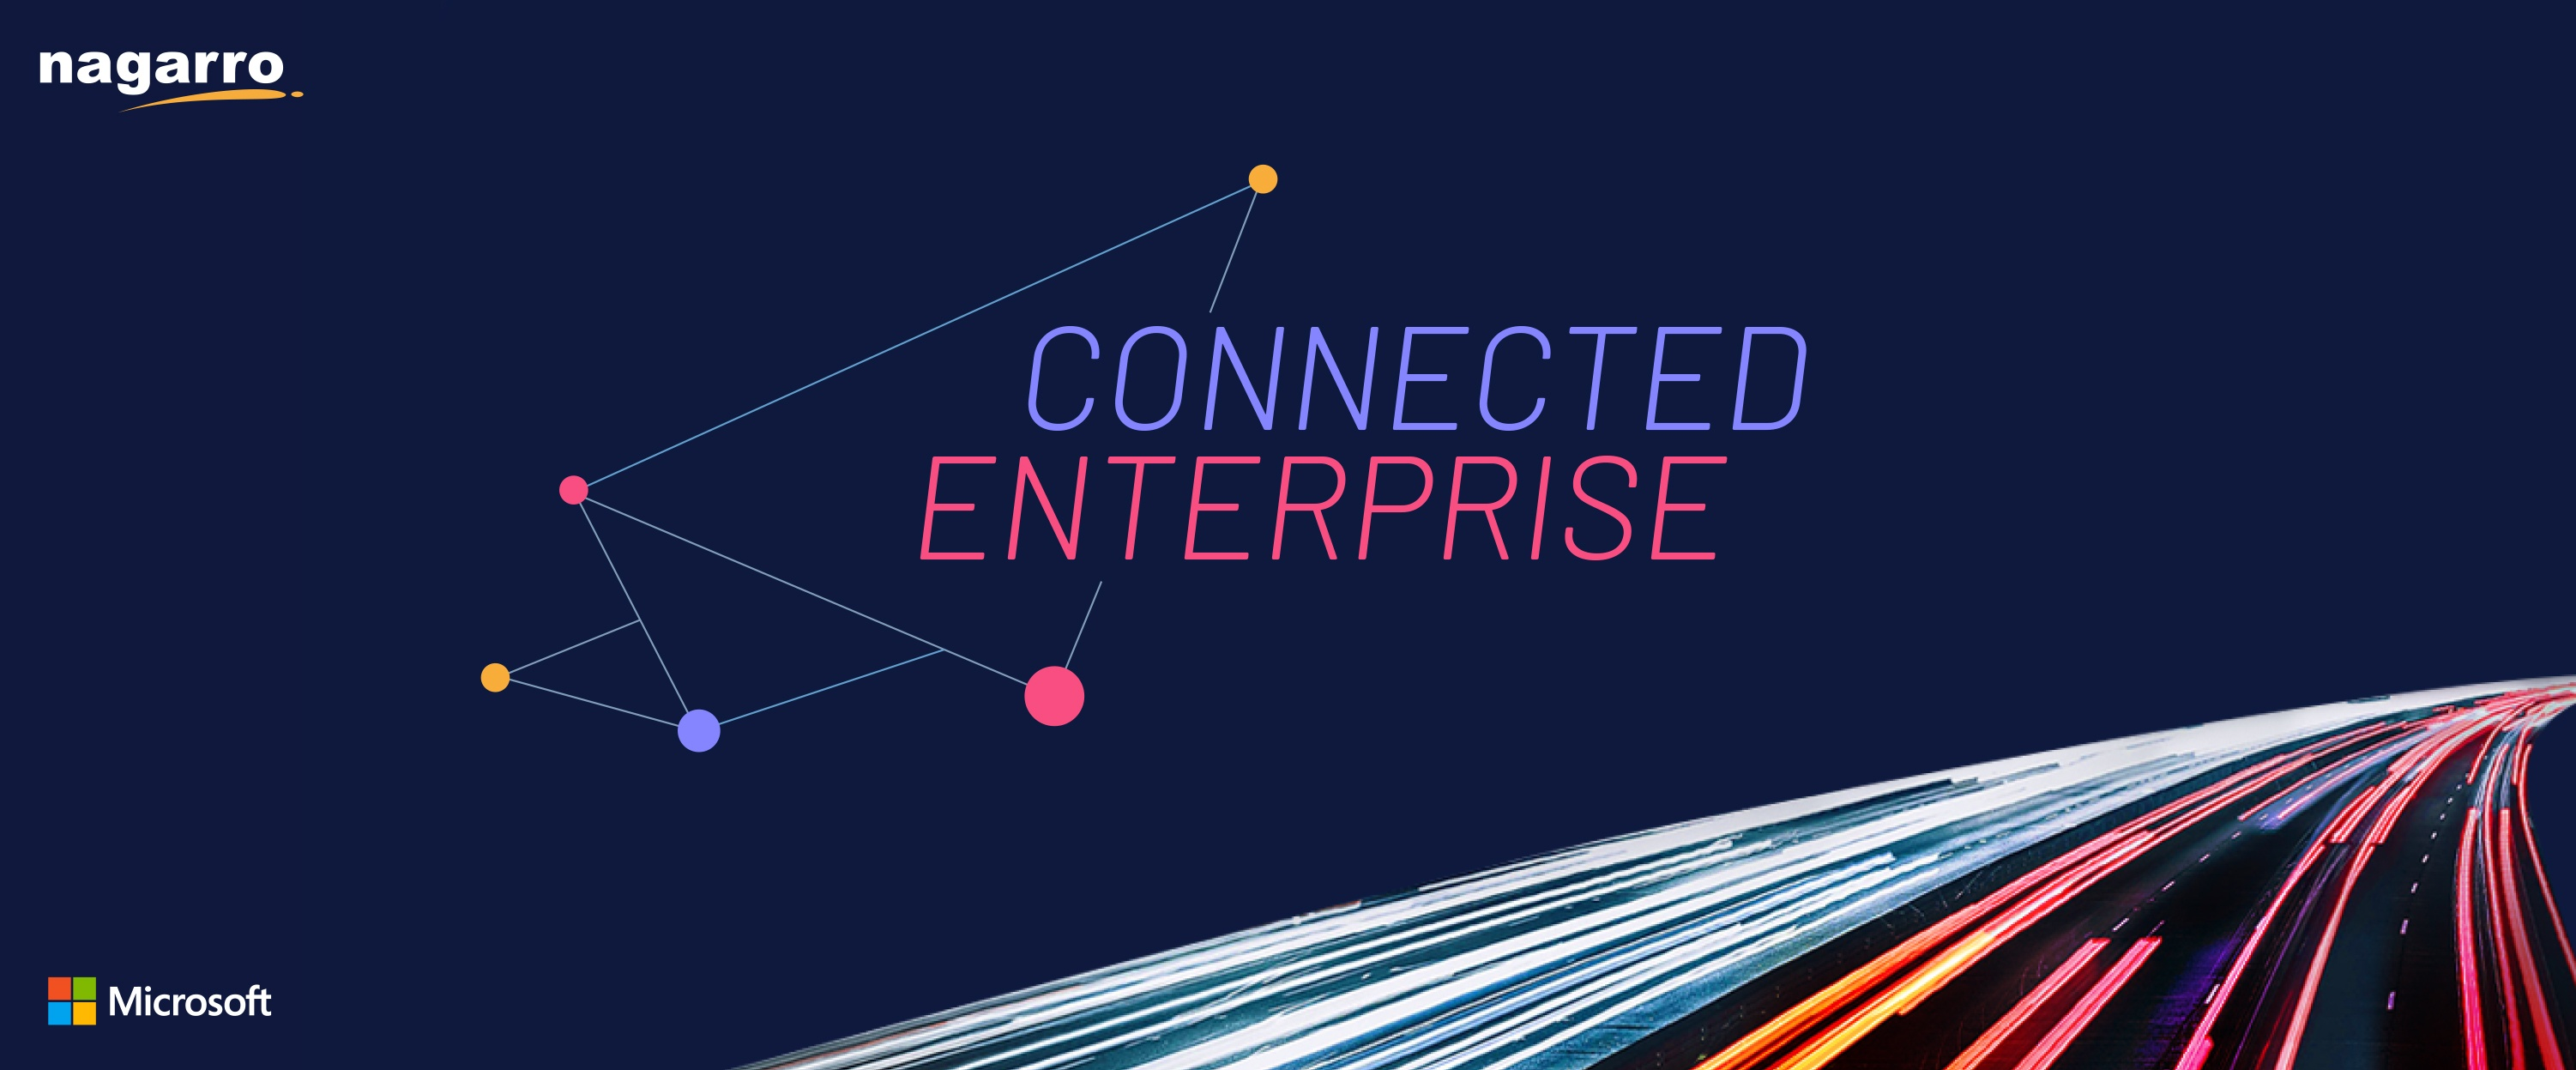 Connected Enterprise banner